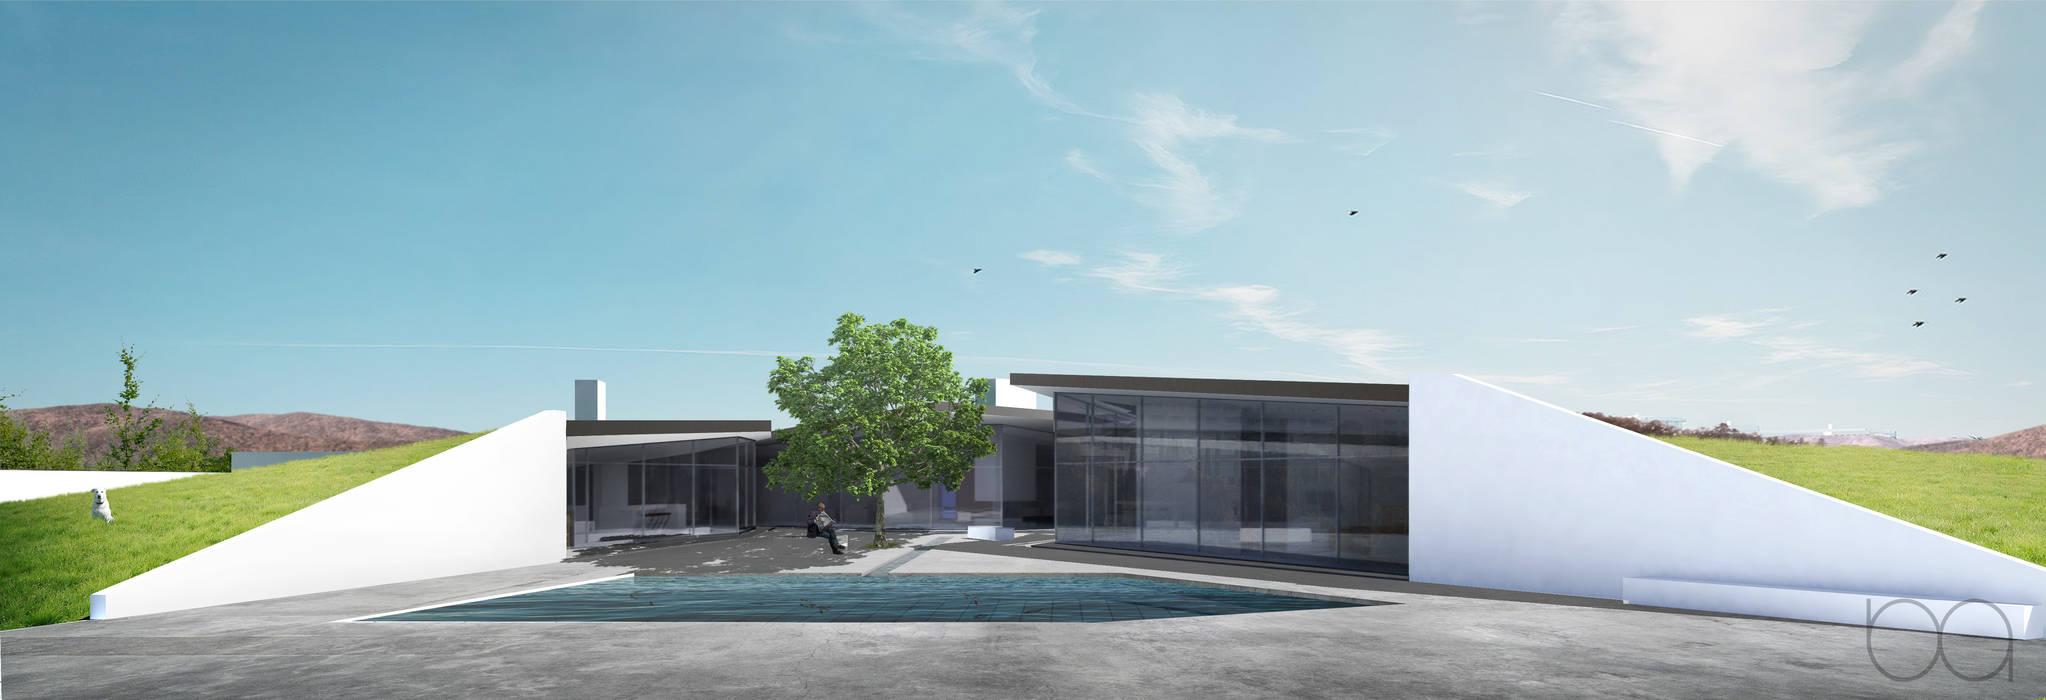 Project UG Barnard & Associates - Architects